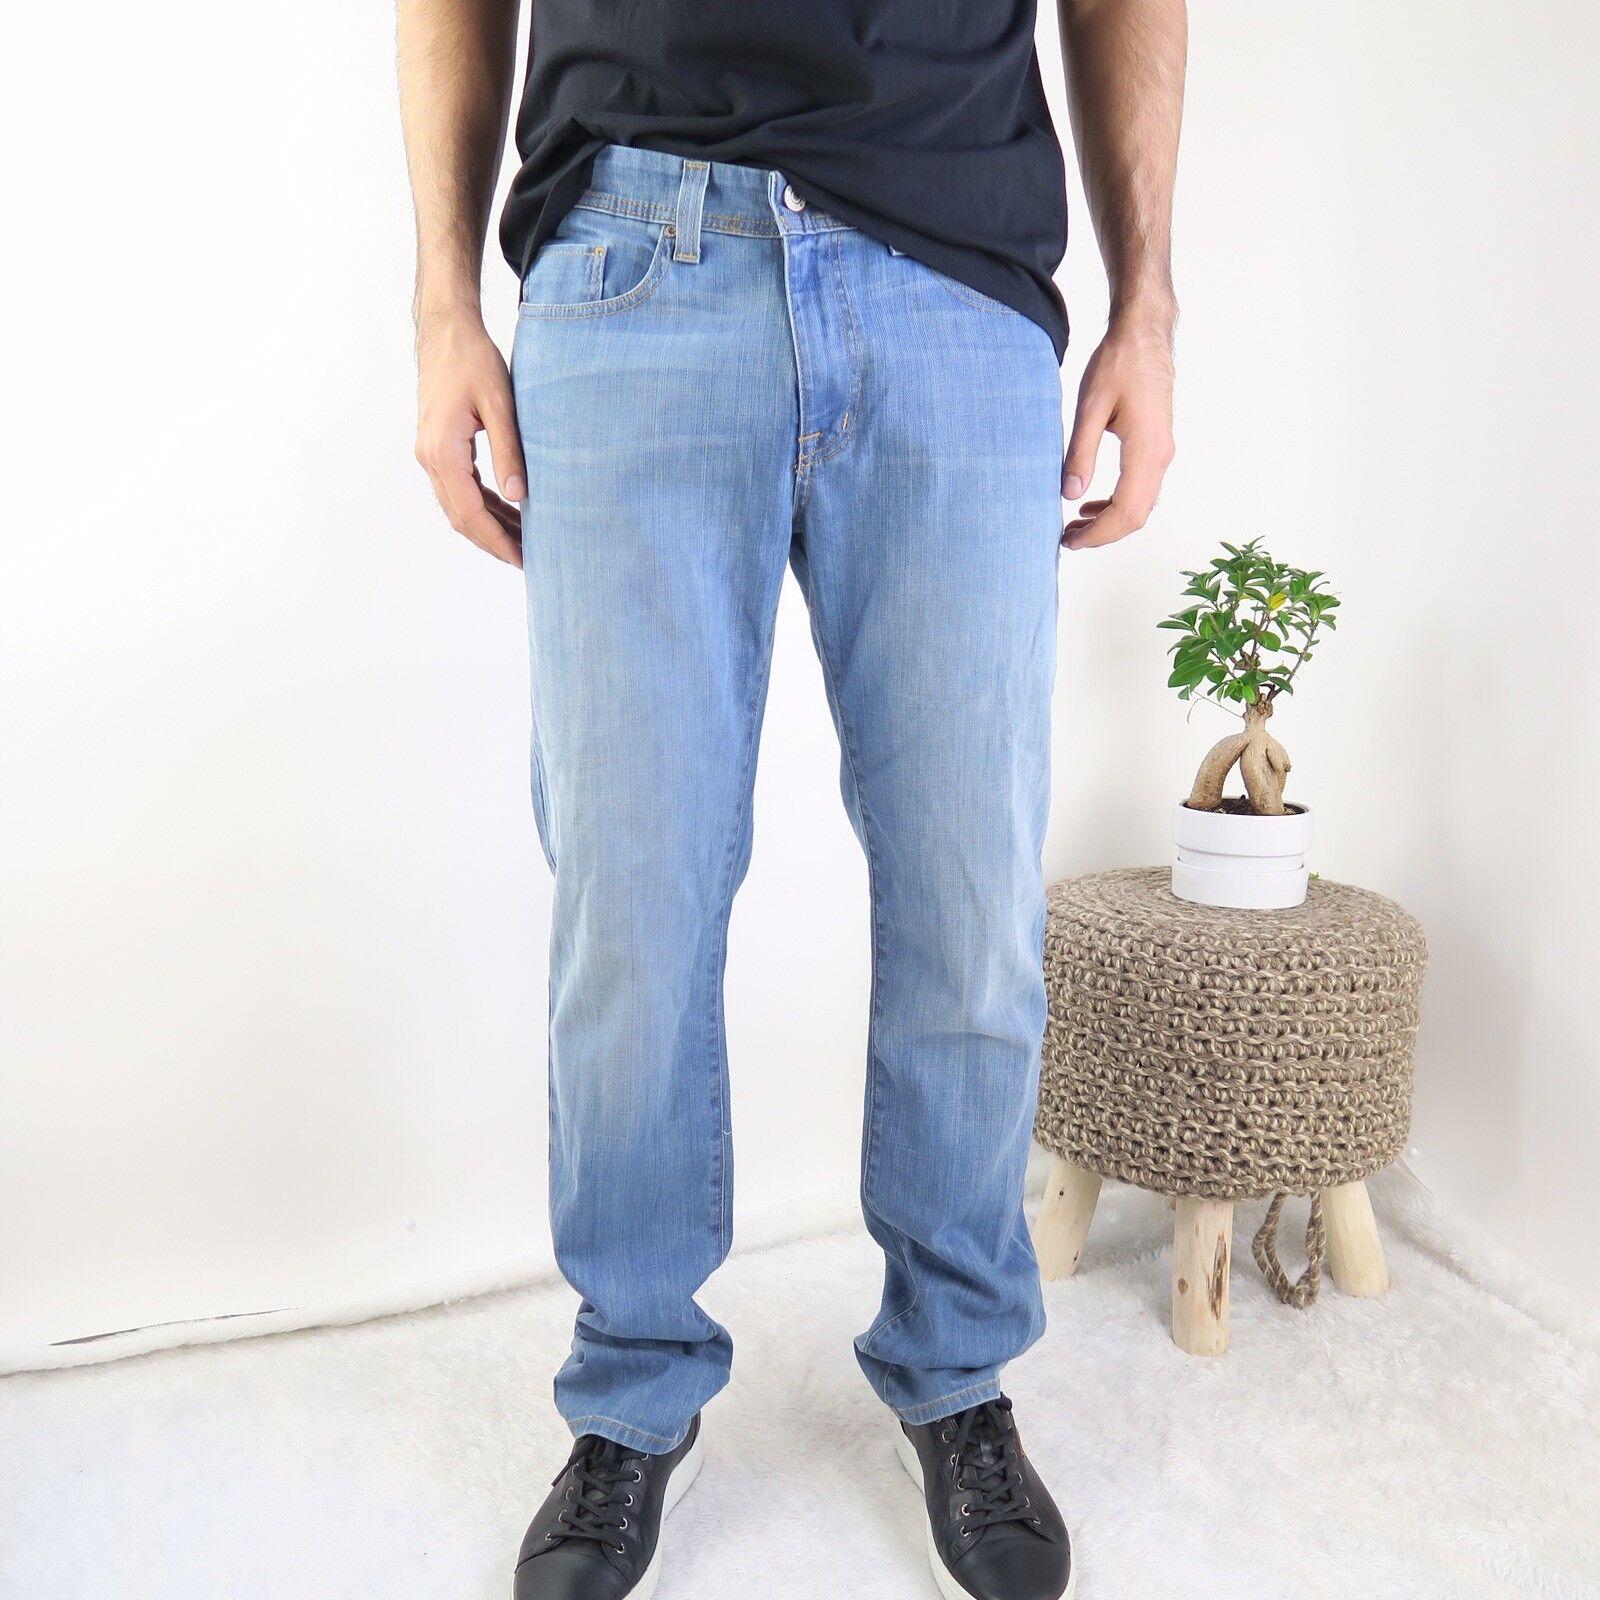 FIDELITY DENIM JIMMY Tailored Slim Jeans In Dorado Vintage - Men's Size 31 NWOT